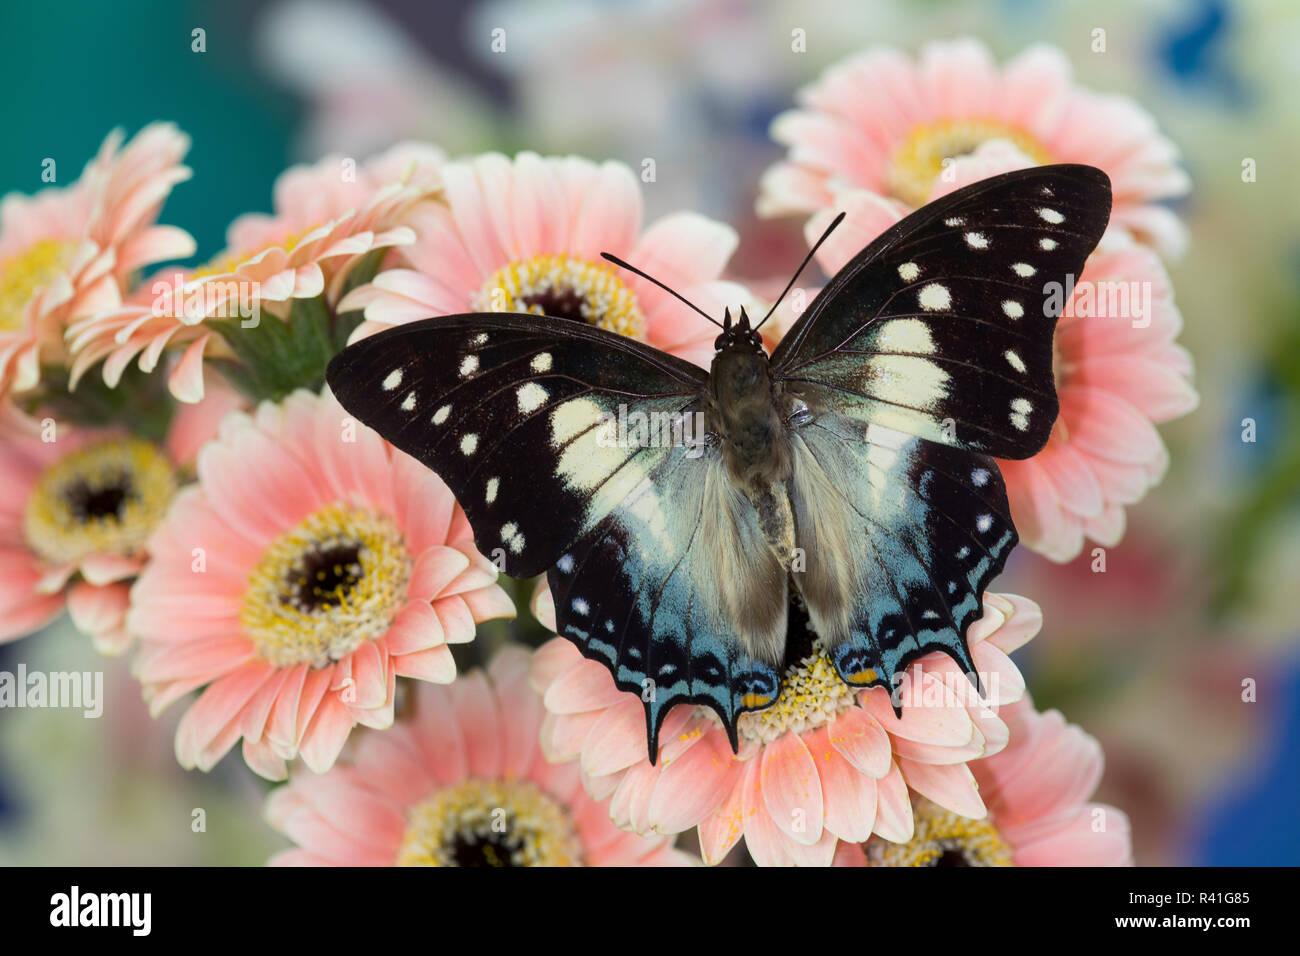 Bộ sưu tập cánh vẩy 4 - Page 18 Tropical-butterfly-polyura-cognatus-sulawesi-blue-nawab-a-dagger-tailed-butterfly-on-gerber-daisy-R41G85